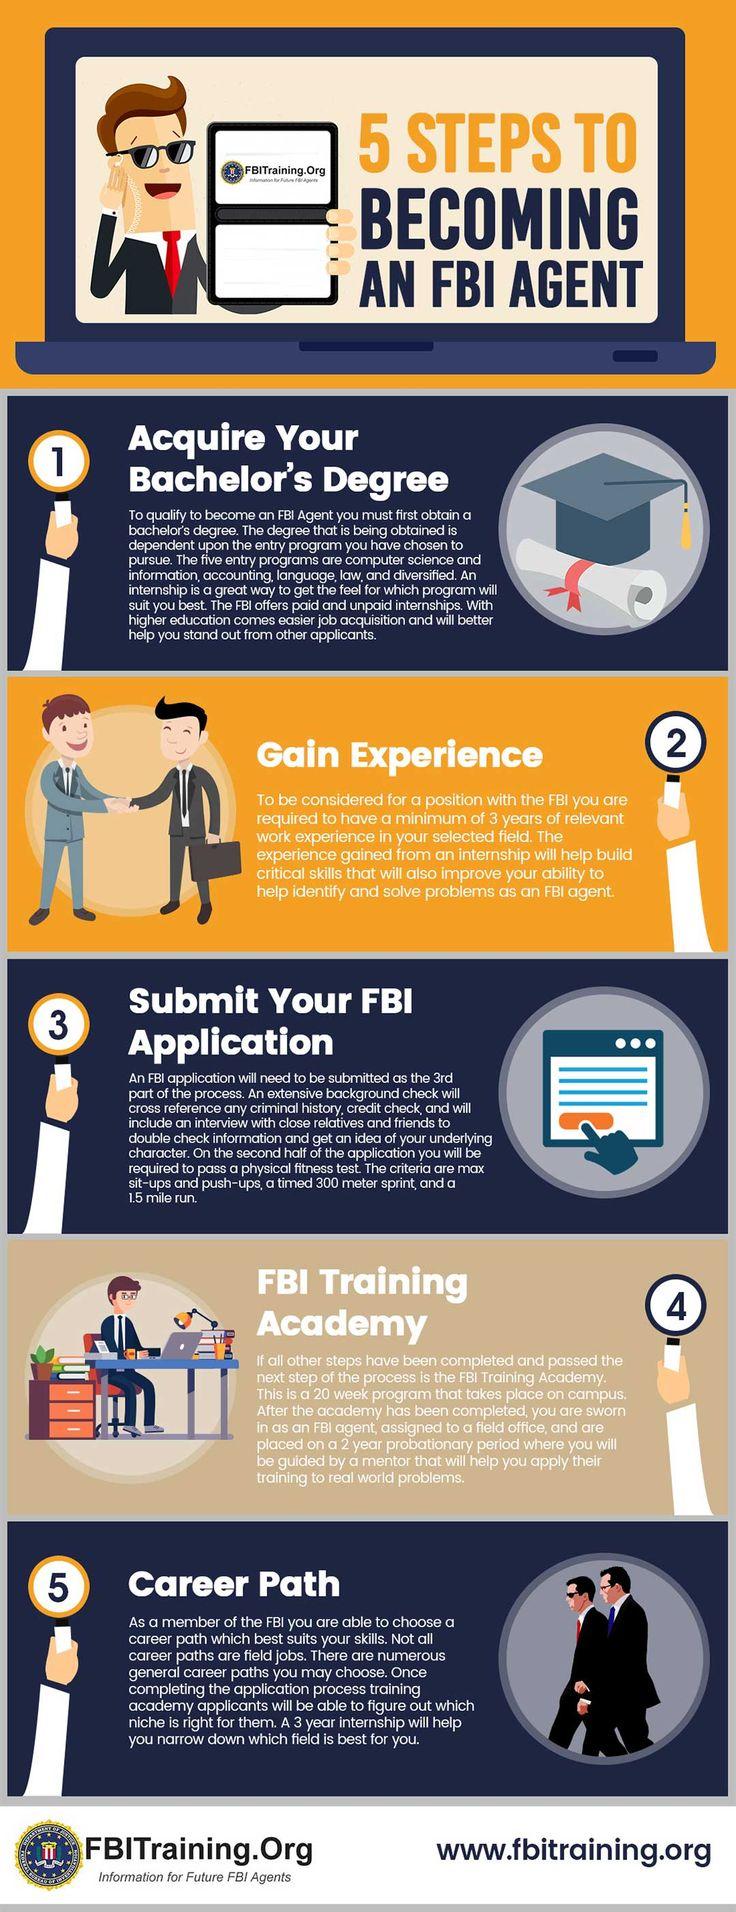 5 Steps to an FBI Agent Fbi agent, Fbi training